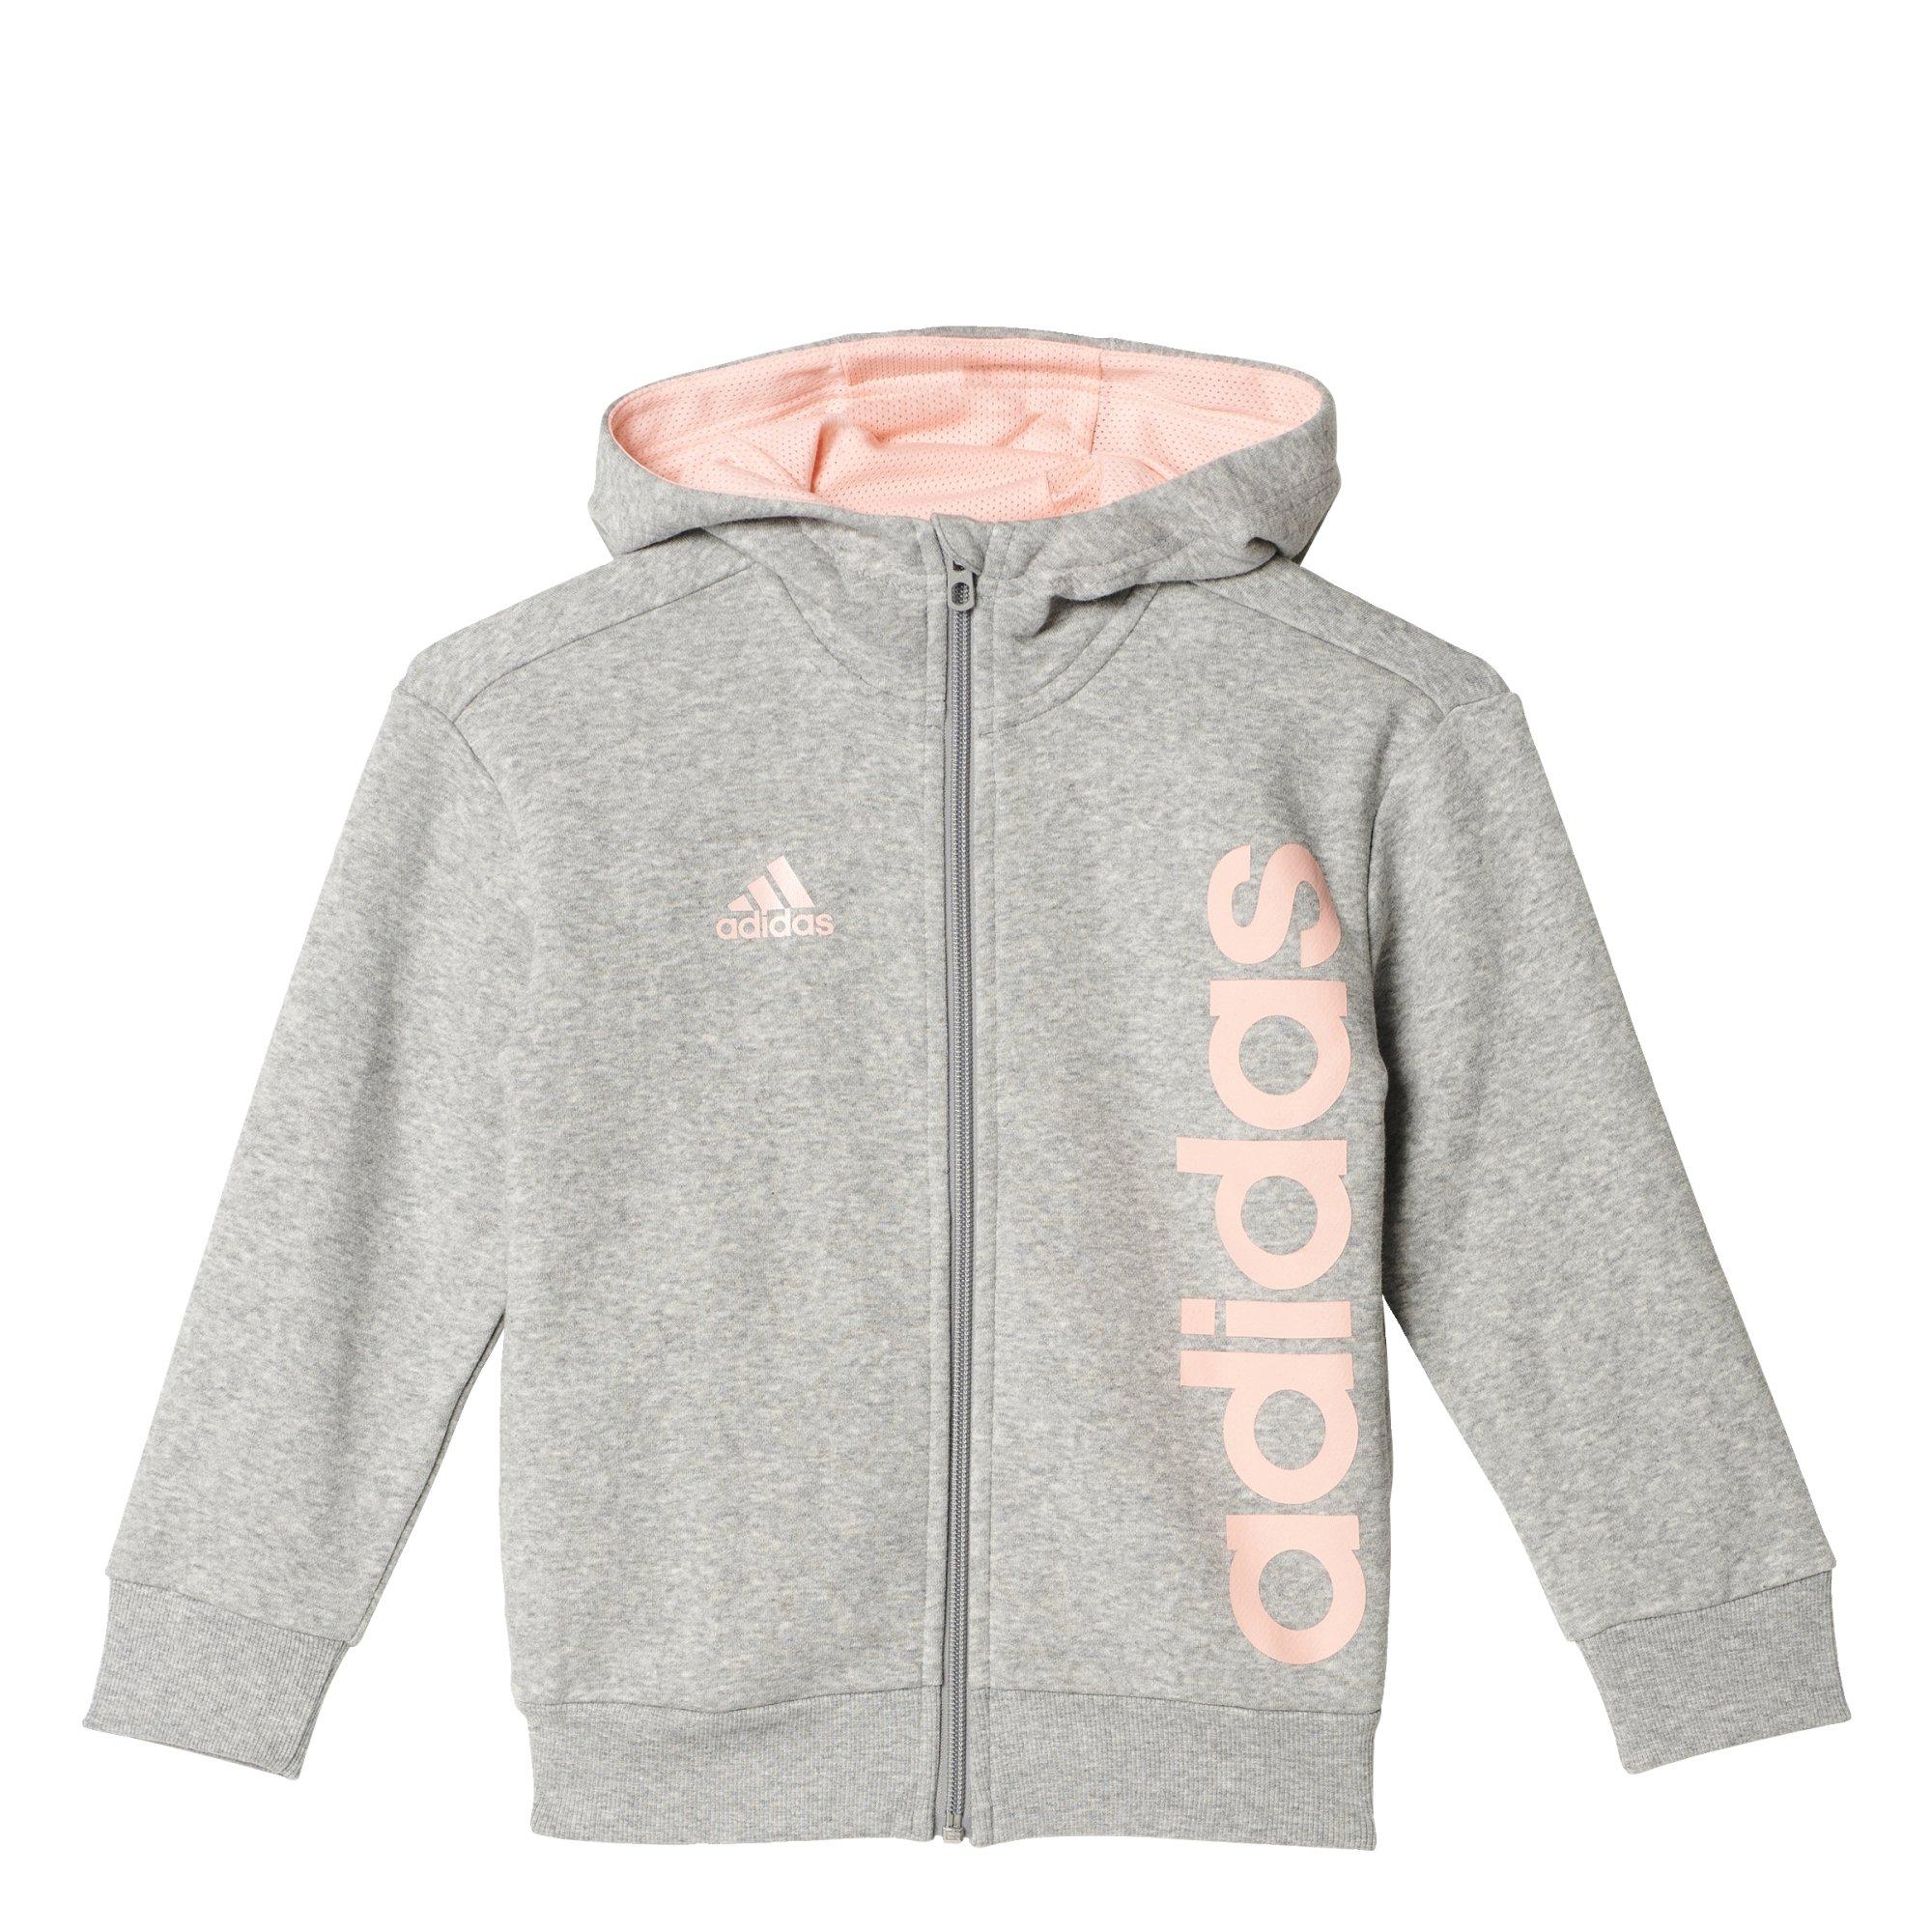 Adidas Lk Lin FZ Hoodi Felpa, bambino, Bambino, Lk Lin Fz Hoodi, Grigio (brgrin)